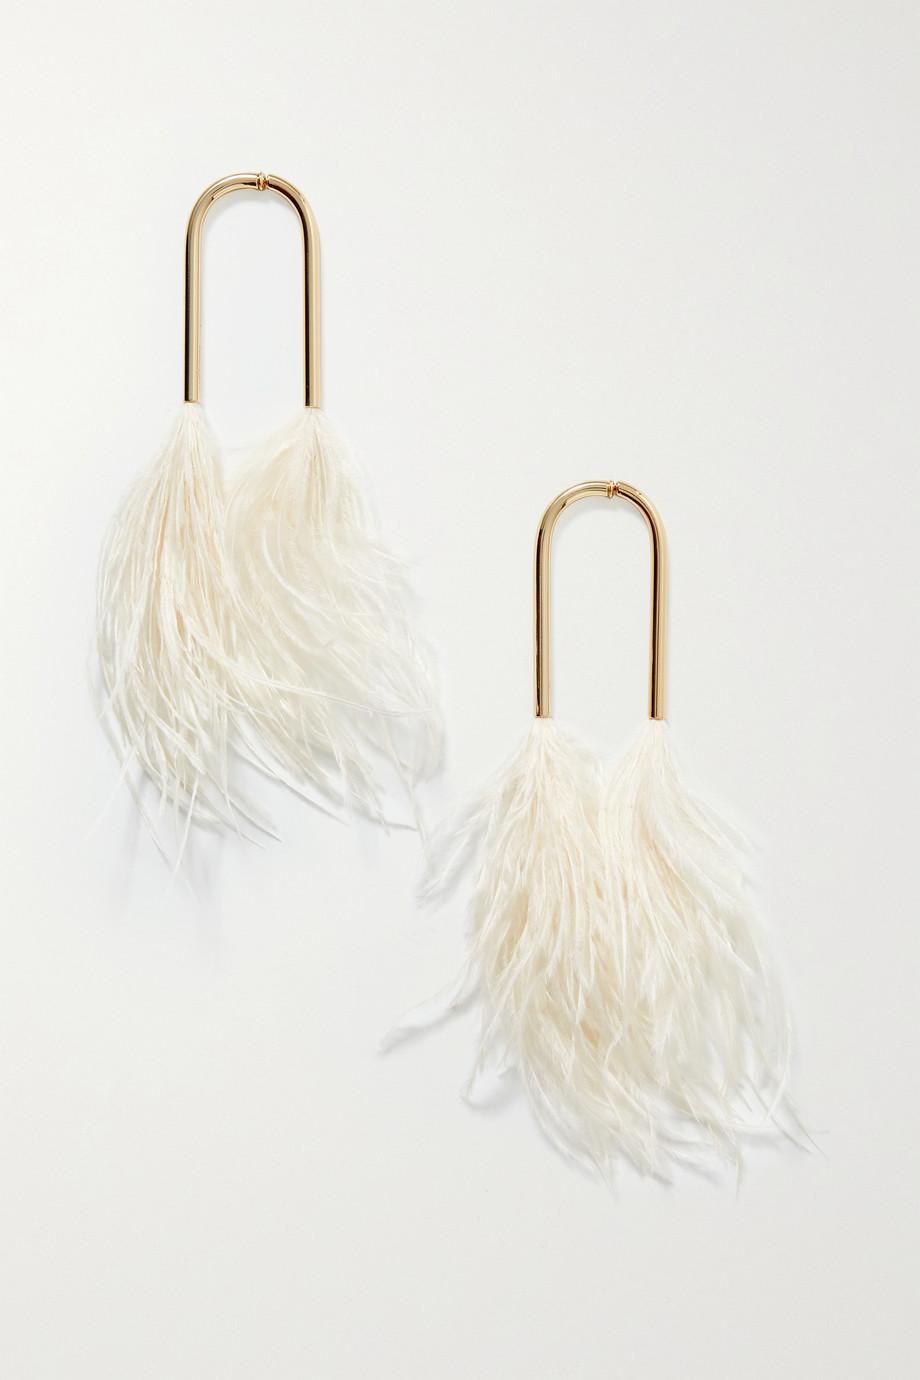 Cult Gaia Meta gold-tone feather earrings